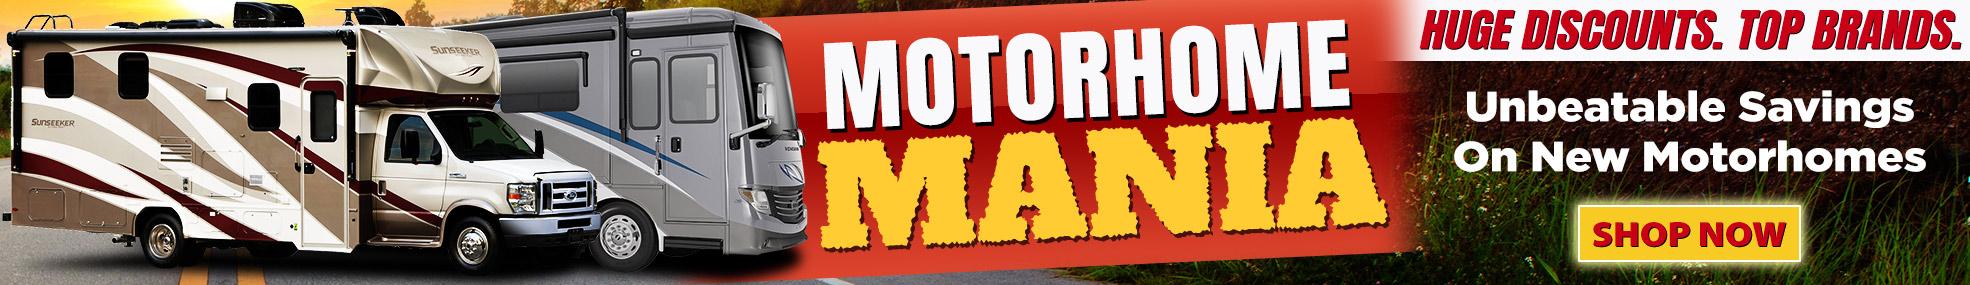 Motor Home Mania